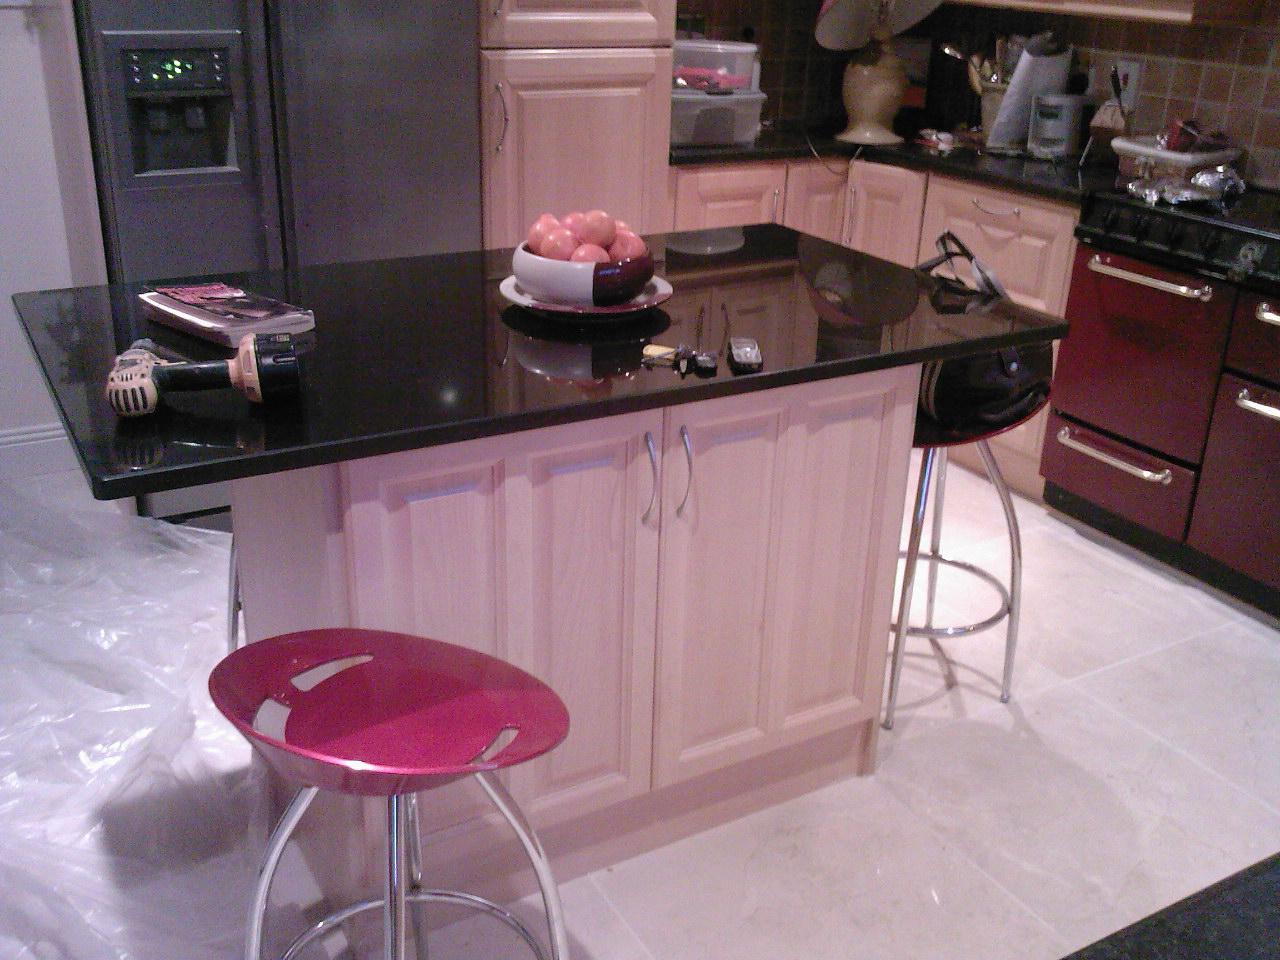 granite kitchen designs pictures photo - 4